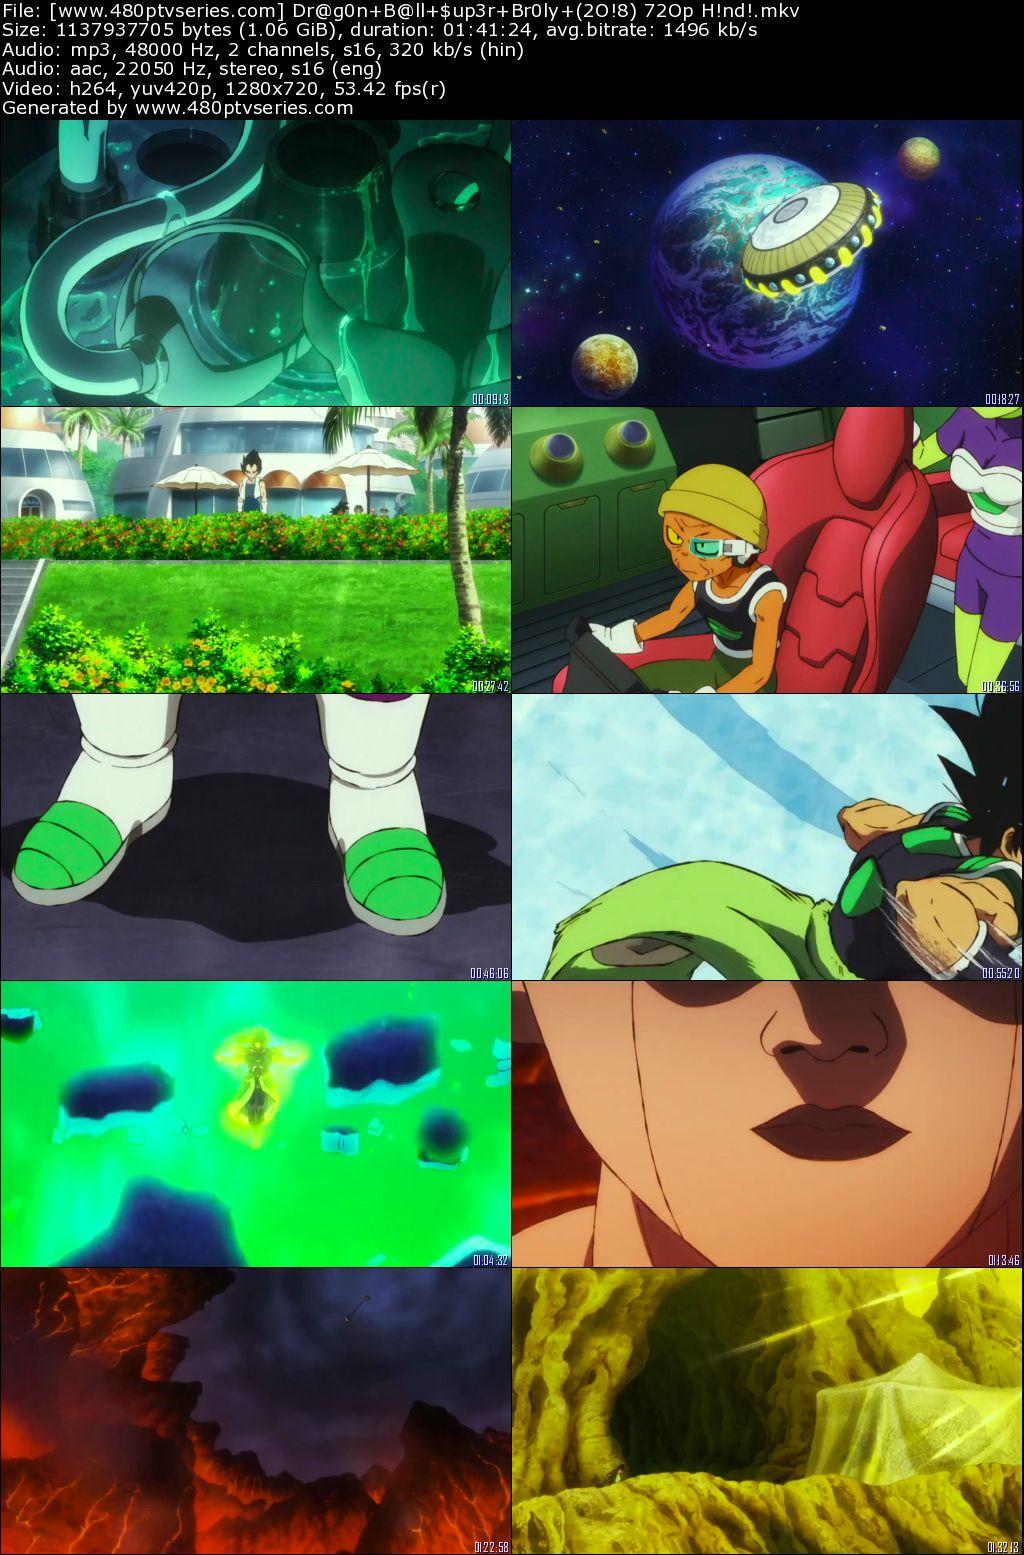 Download Dragon Ball Super Broly (2018) 1GB Full Hindi Dual Audio Movie Download 720p Bluray Free Watch Online Full Movie Download Worldfree4u 9xmovies